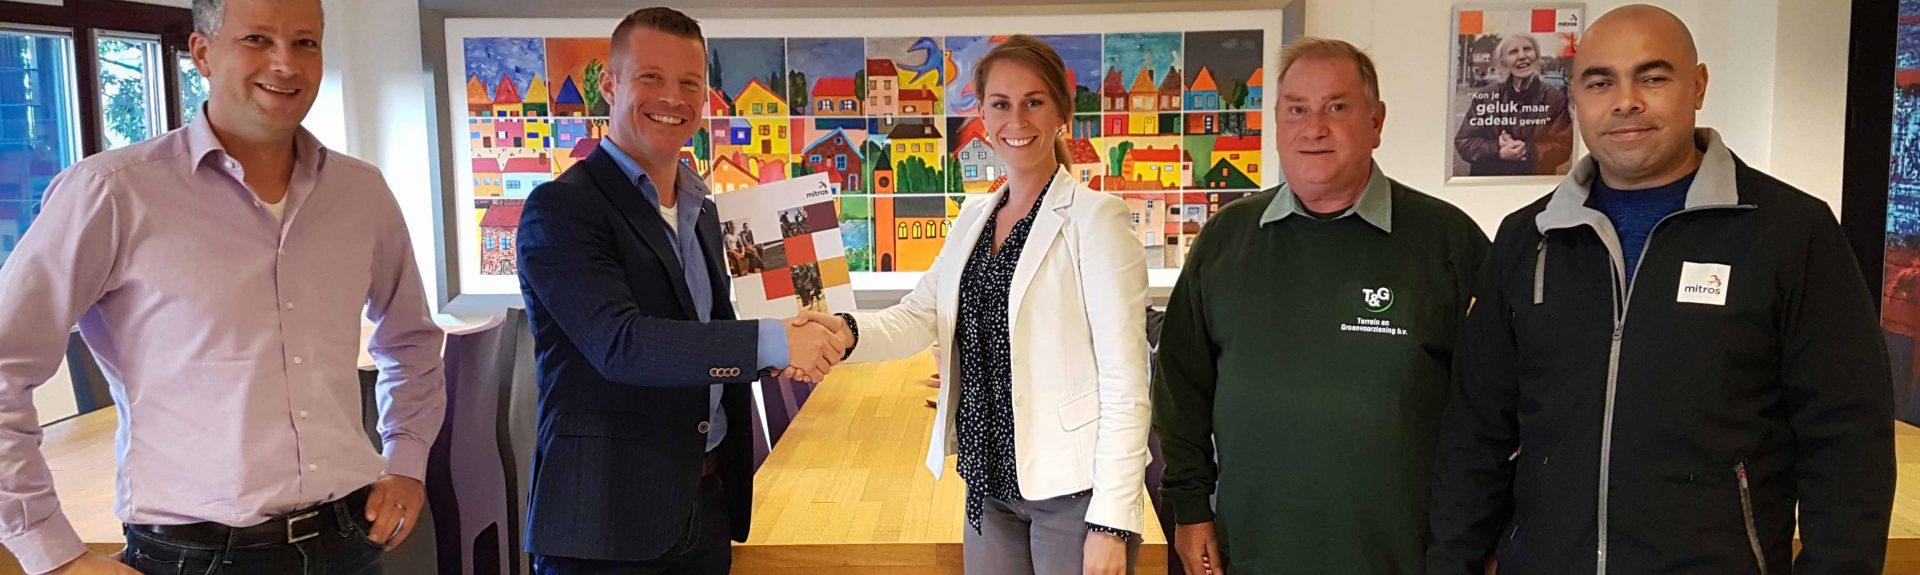 Mitros-verlengd-partnership-T&G-Terrein-en-Groenvoorziening-2